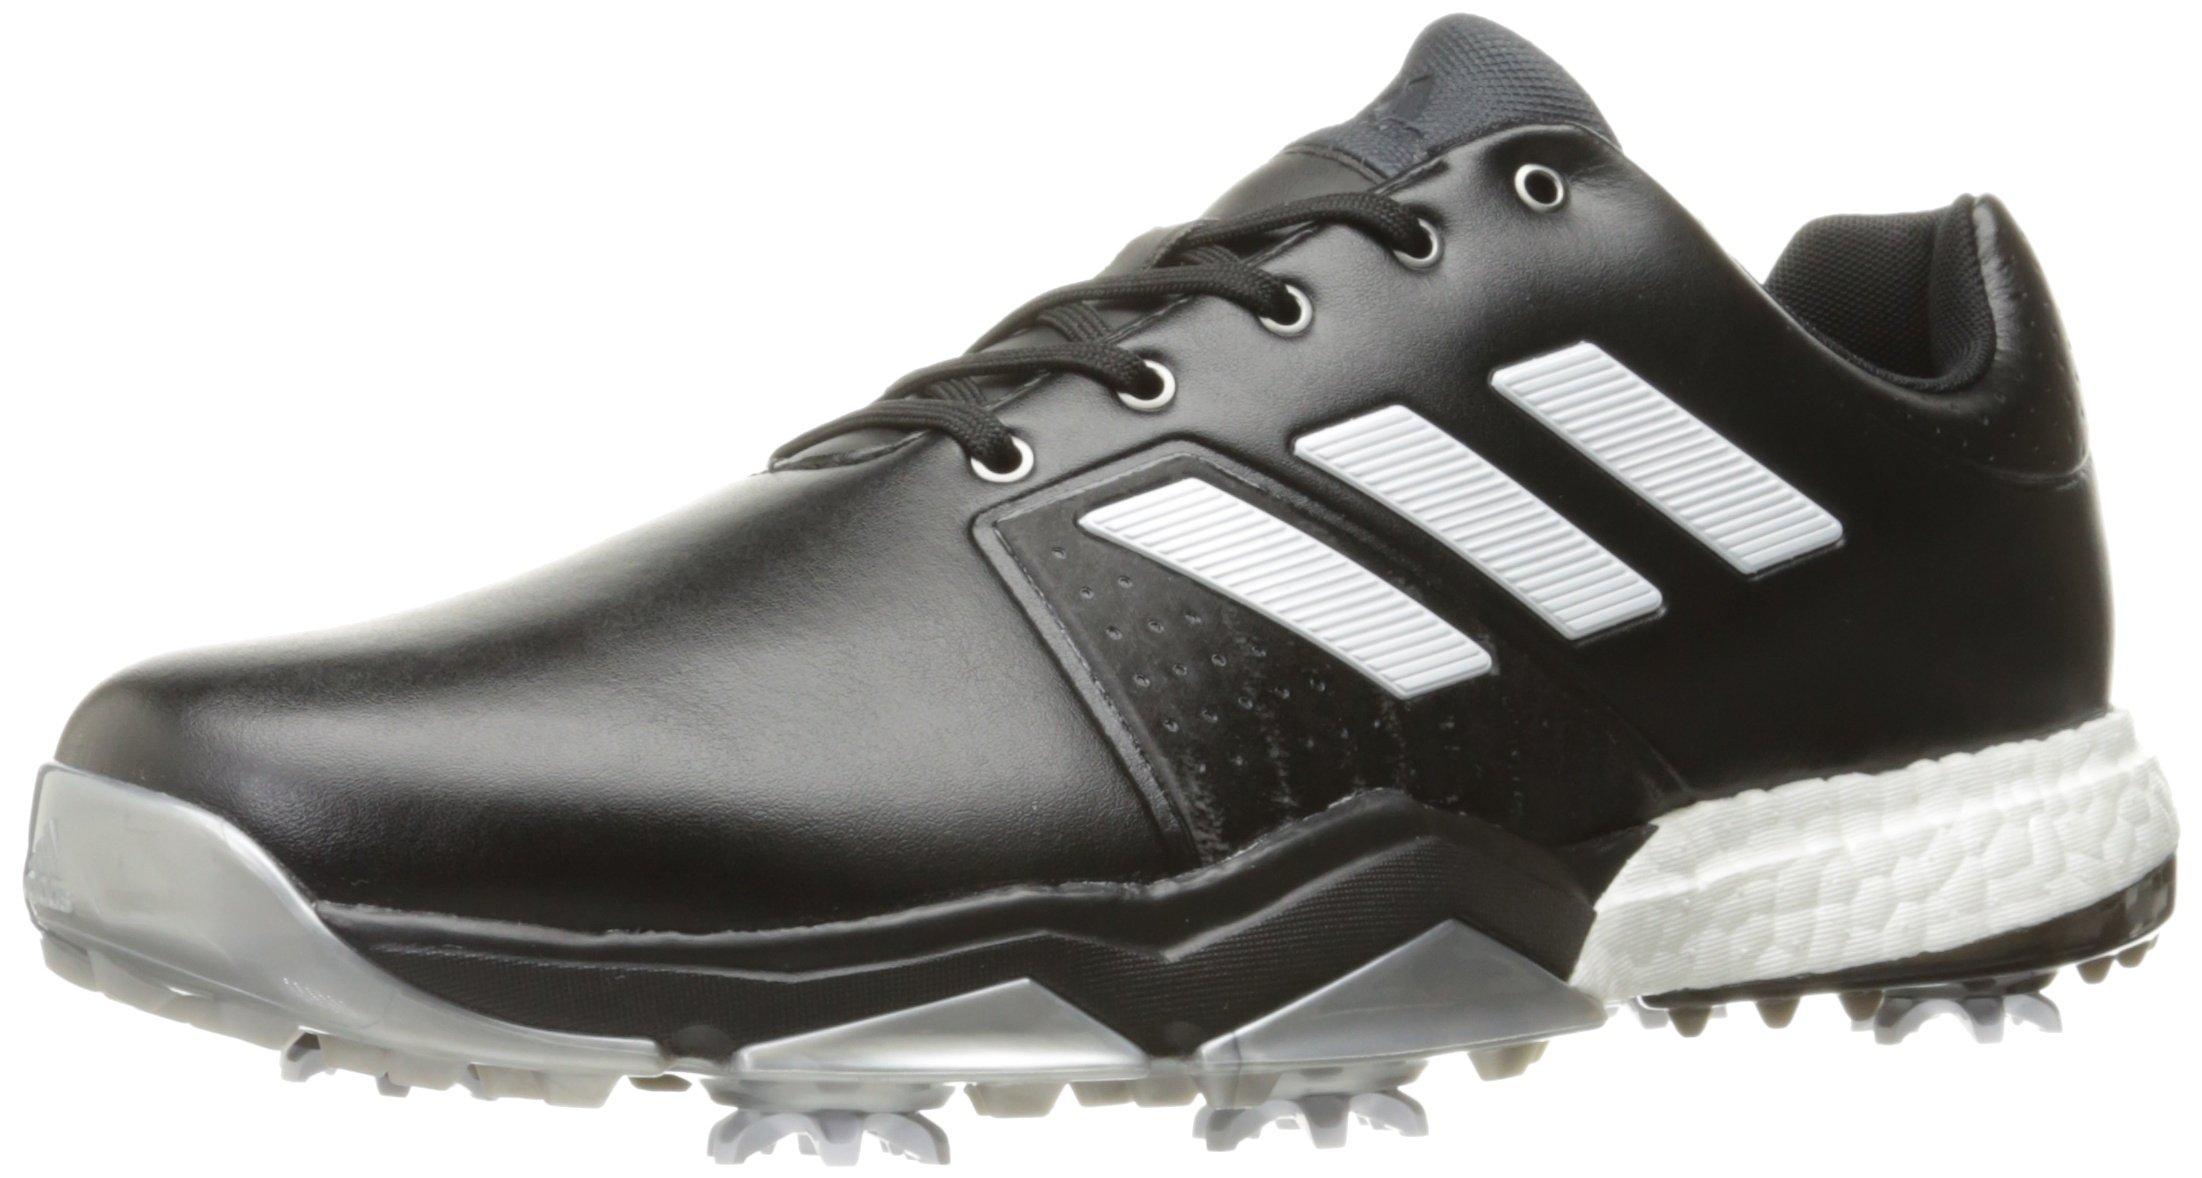 adidas Men's Adipower Boost 3 WD Golf Shoe, Black/White/Silver Metallic, 7.5 W US